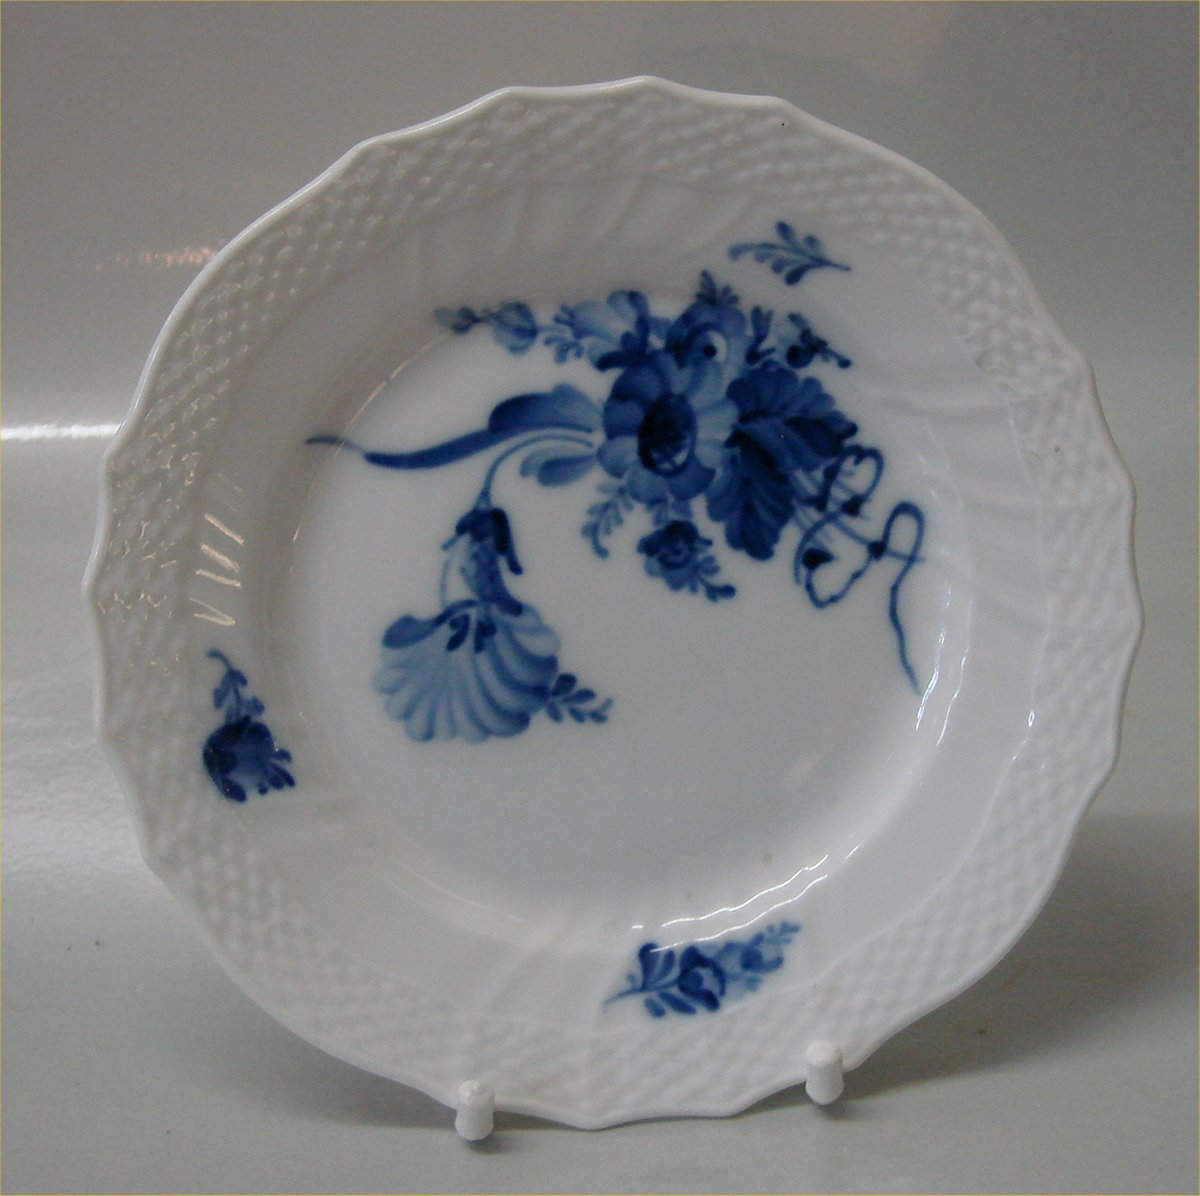 b707103202c3 Dinnerware China Royal Copenhagen alluminia porcelæn